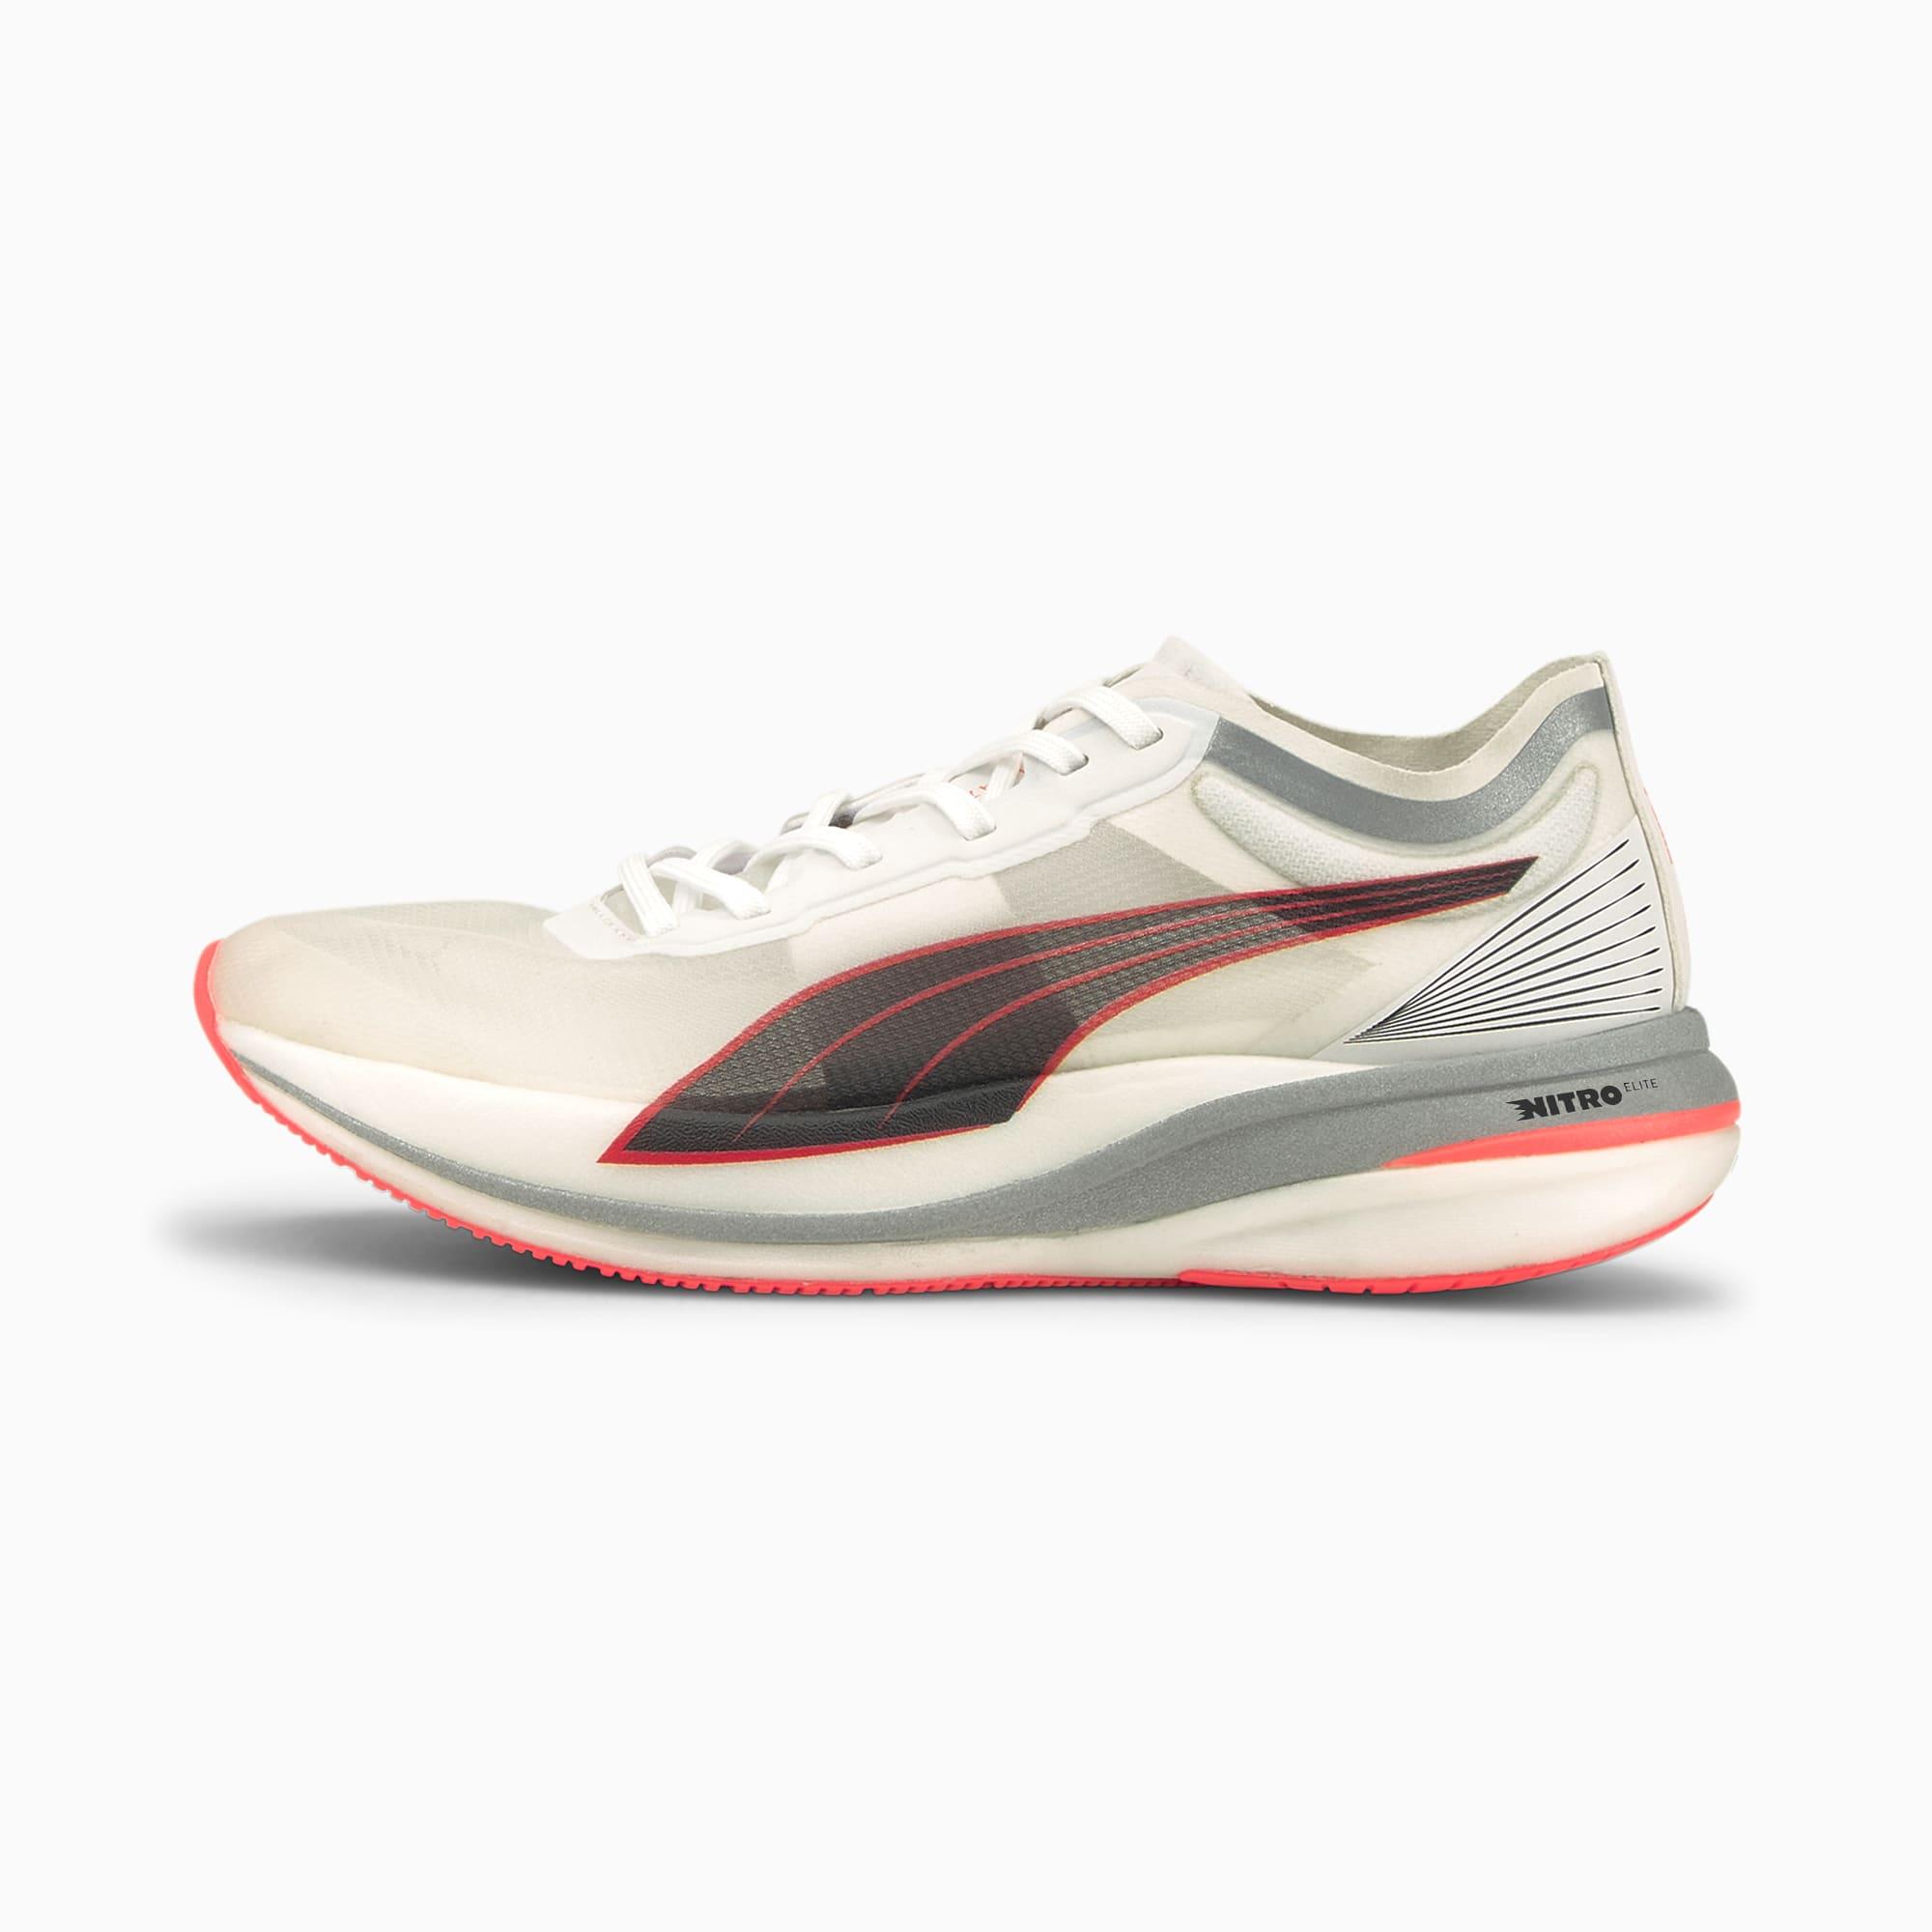 Deviate NITRO ELITE Men's Running Shoes